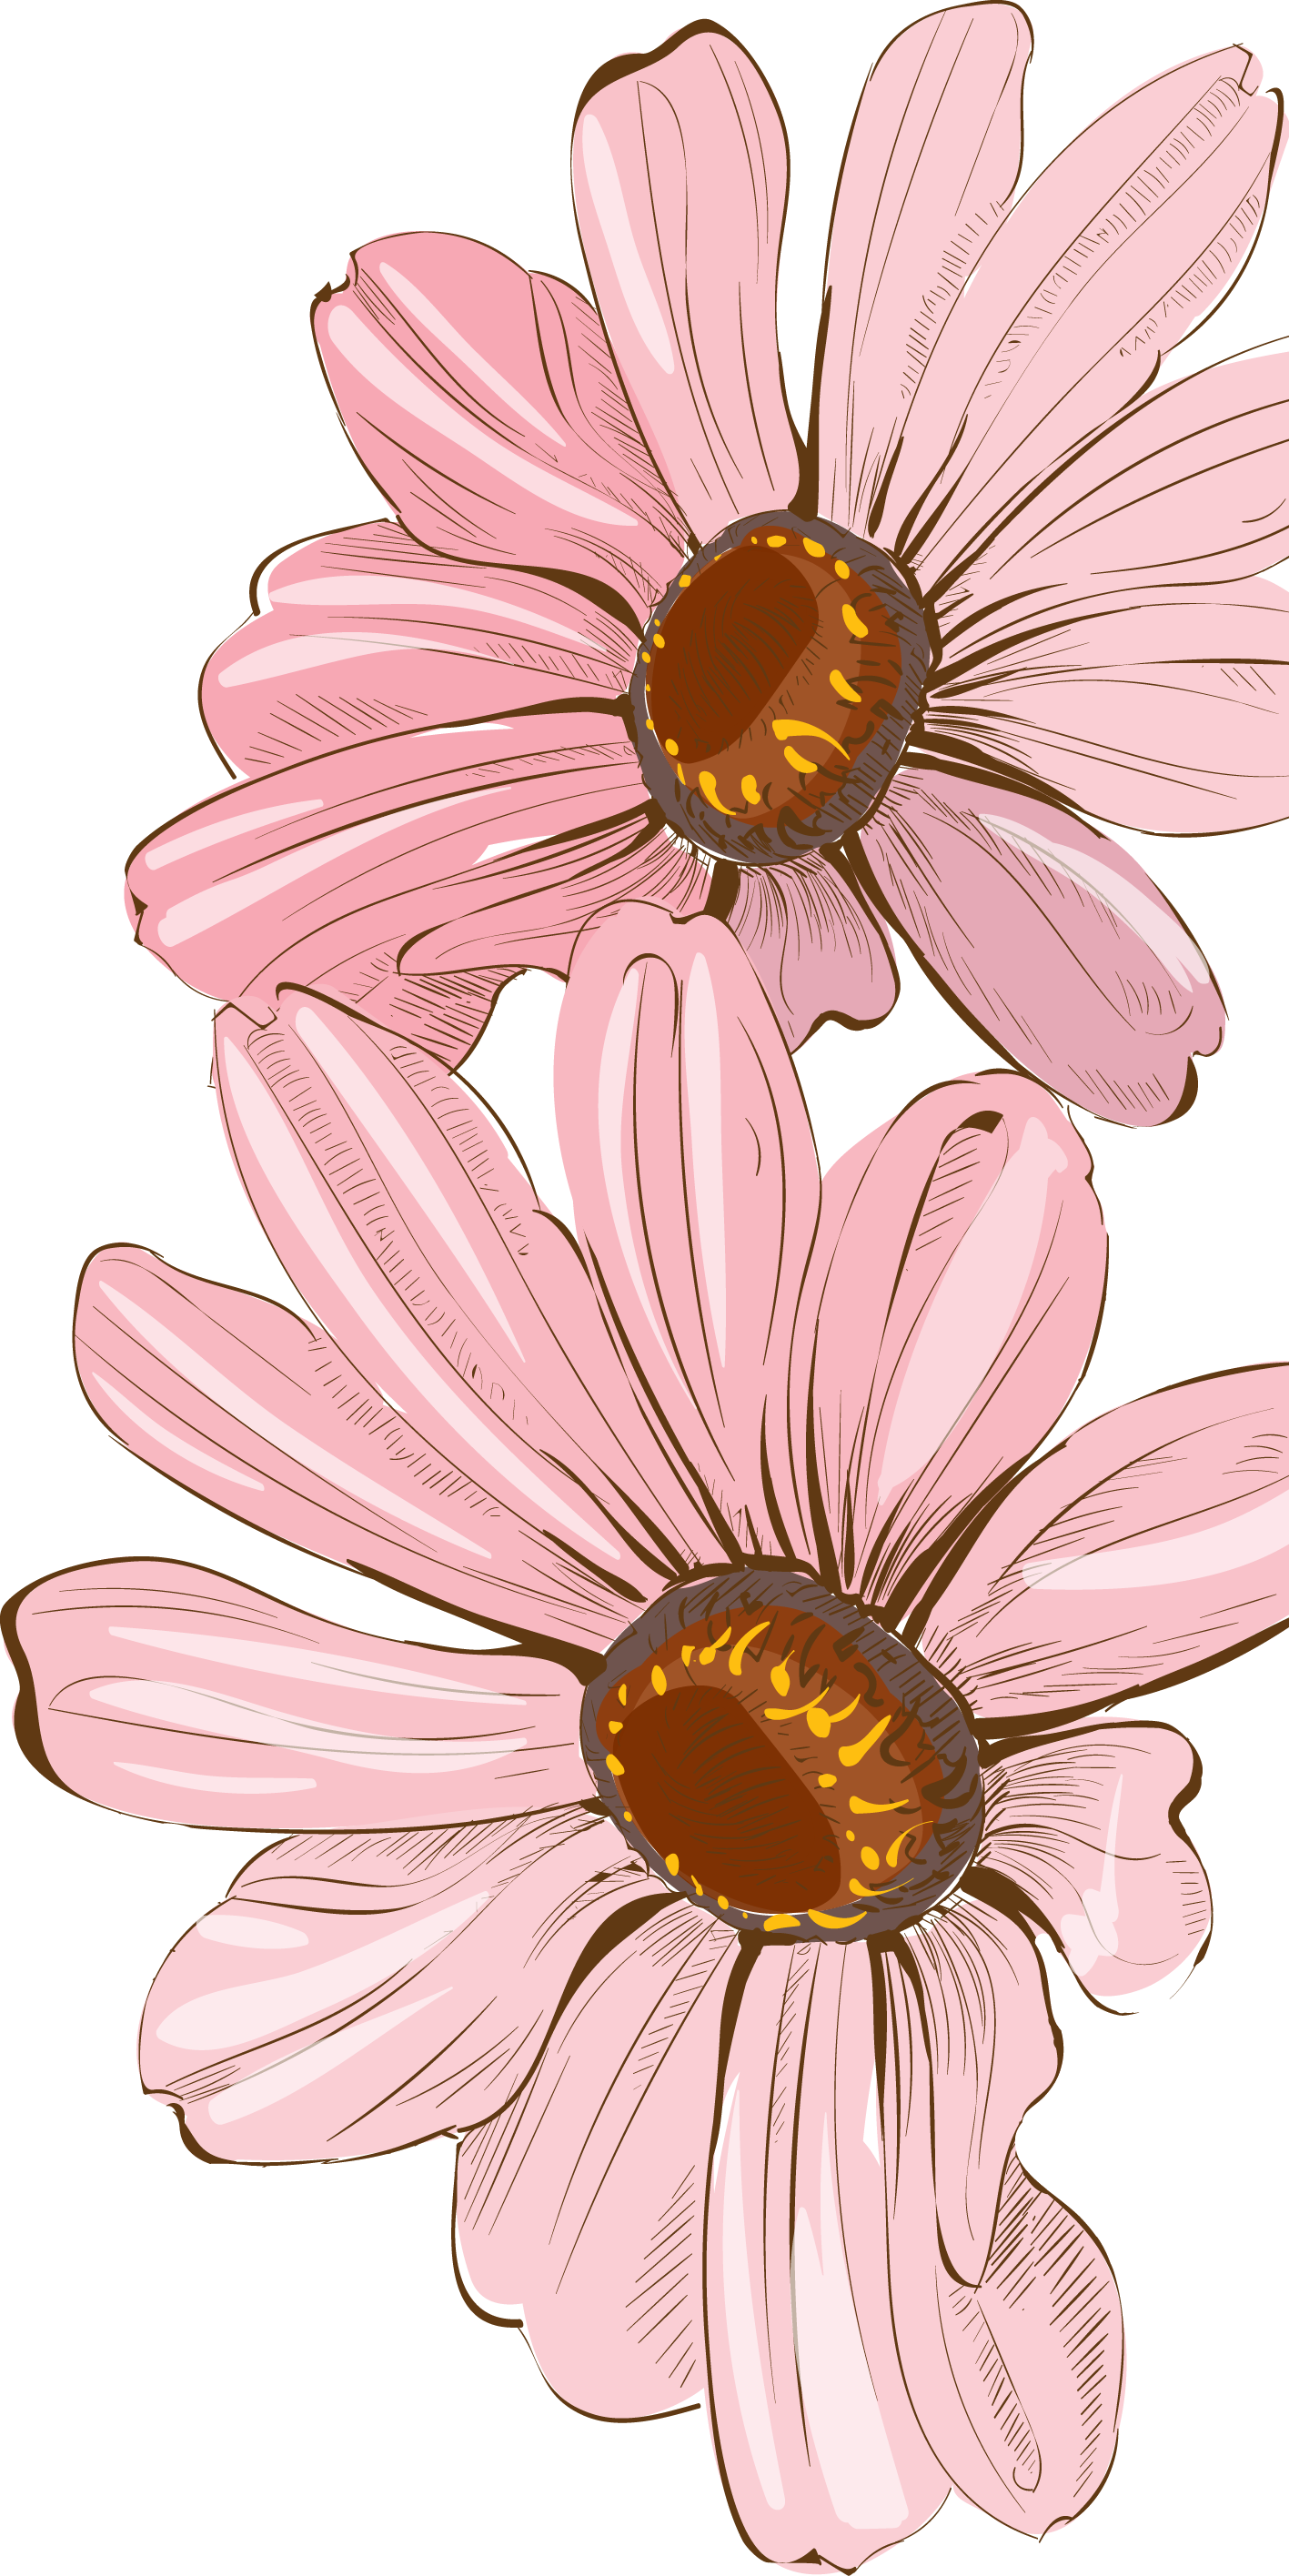 Daisy Flower Clip Art   White Daisy 1 clip art - vector clip art online,  royalty free & public ...   Clip art, Alcohol ink crafts, Free clip art